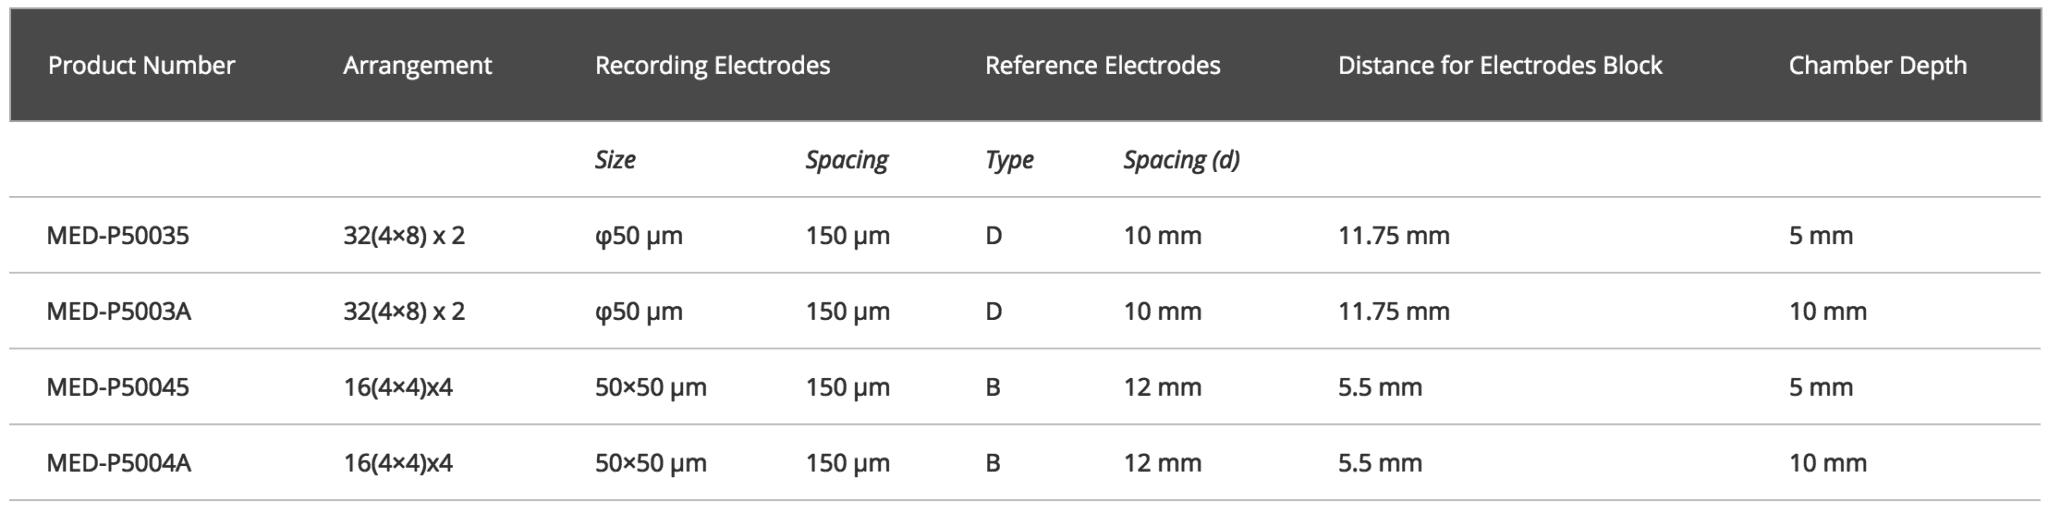 32x2 16x4 Arrays Specifications